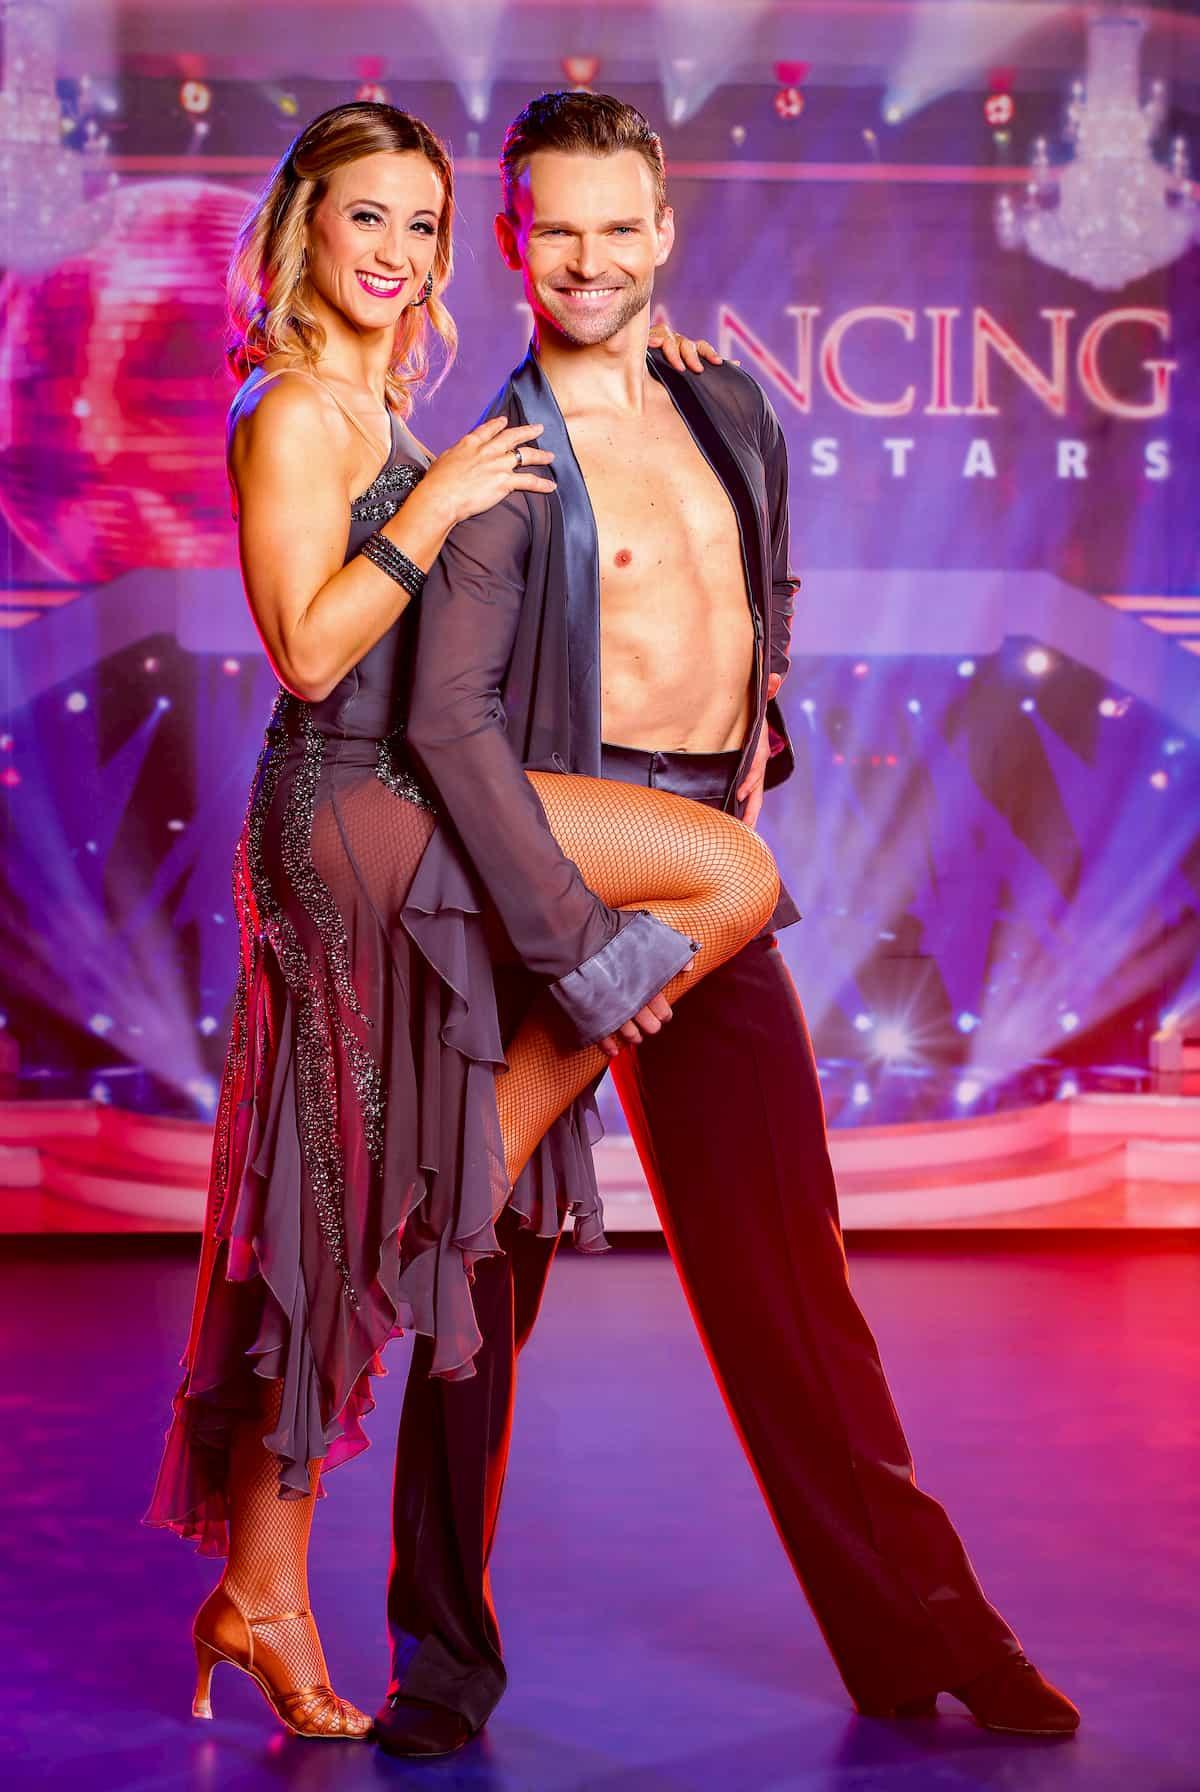 Michaela Kirchgasser - Vadim Garbuzov bei den Dancing Stars am 6.11.2020